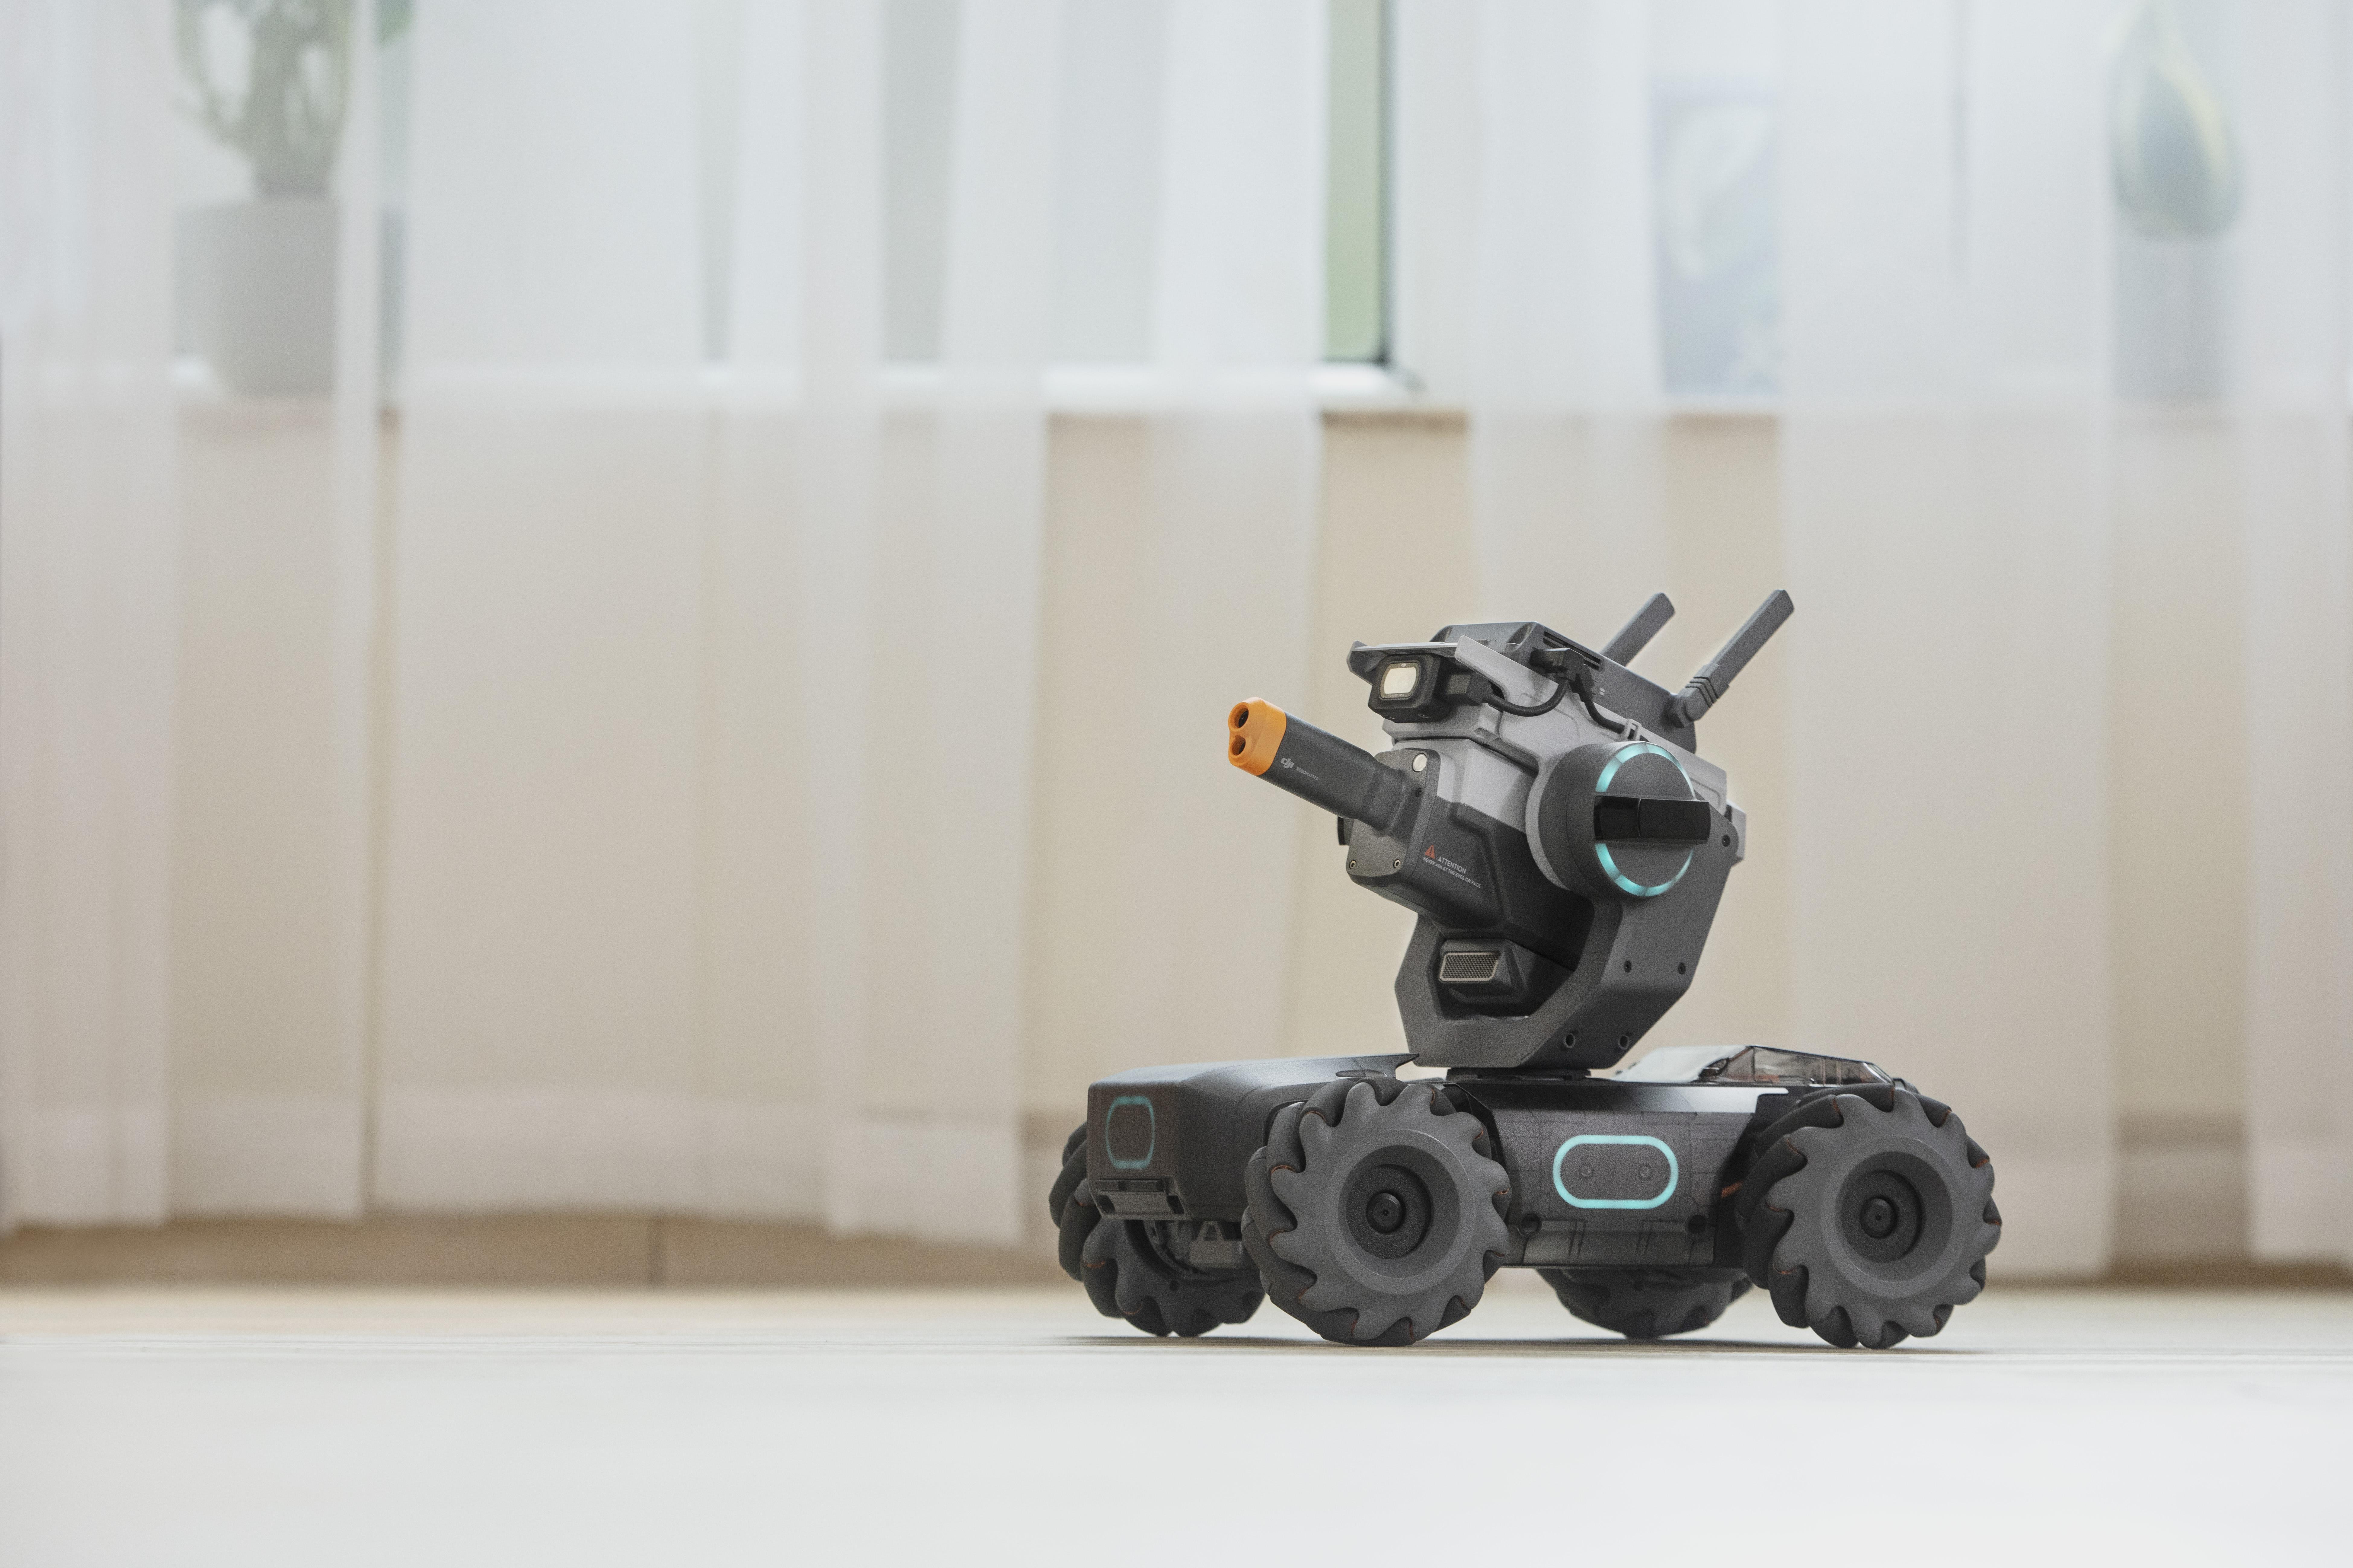 Meet the DJI RoboMaster S1, a mini tank drone and Trojan